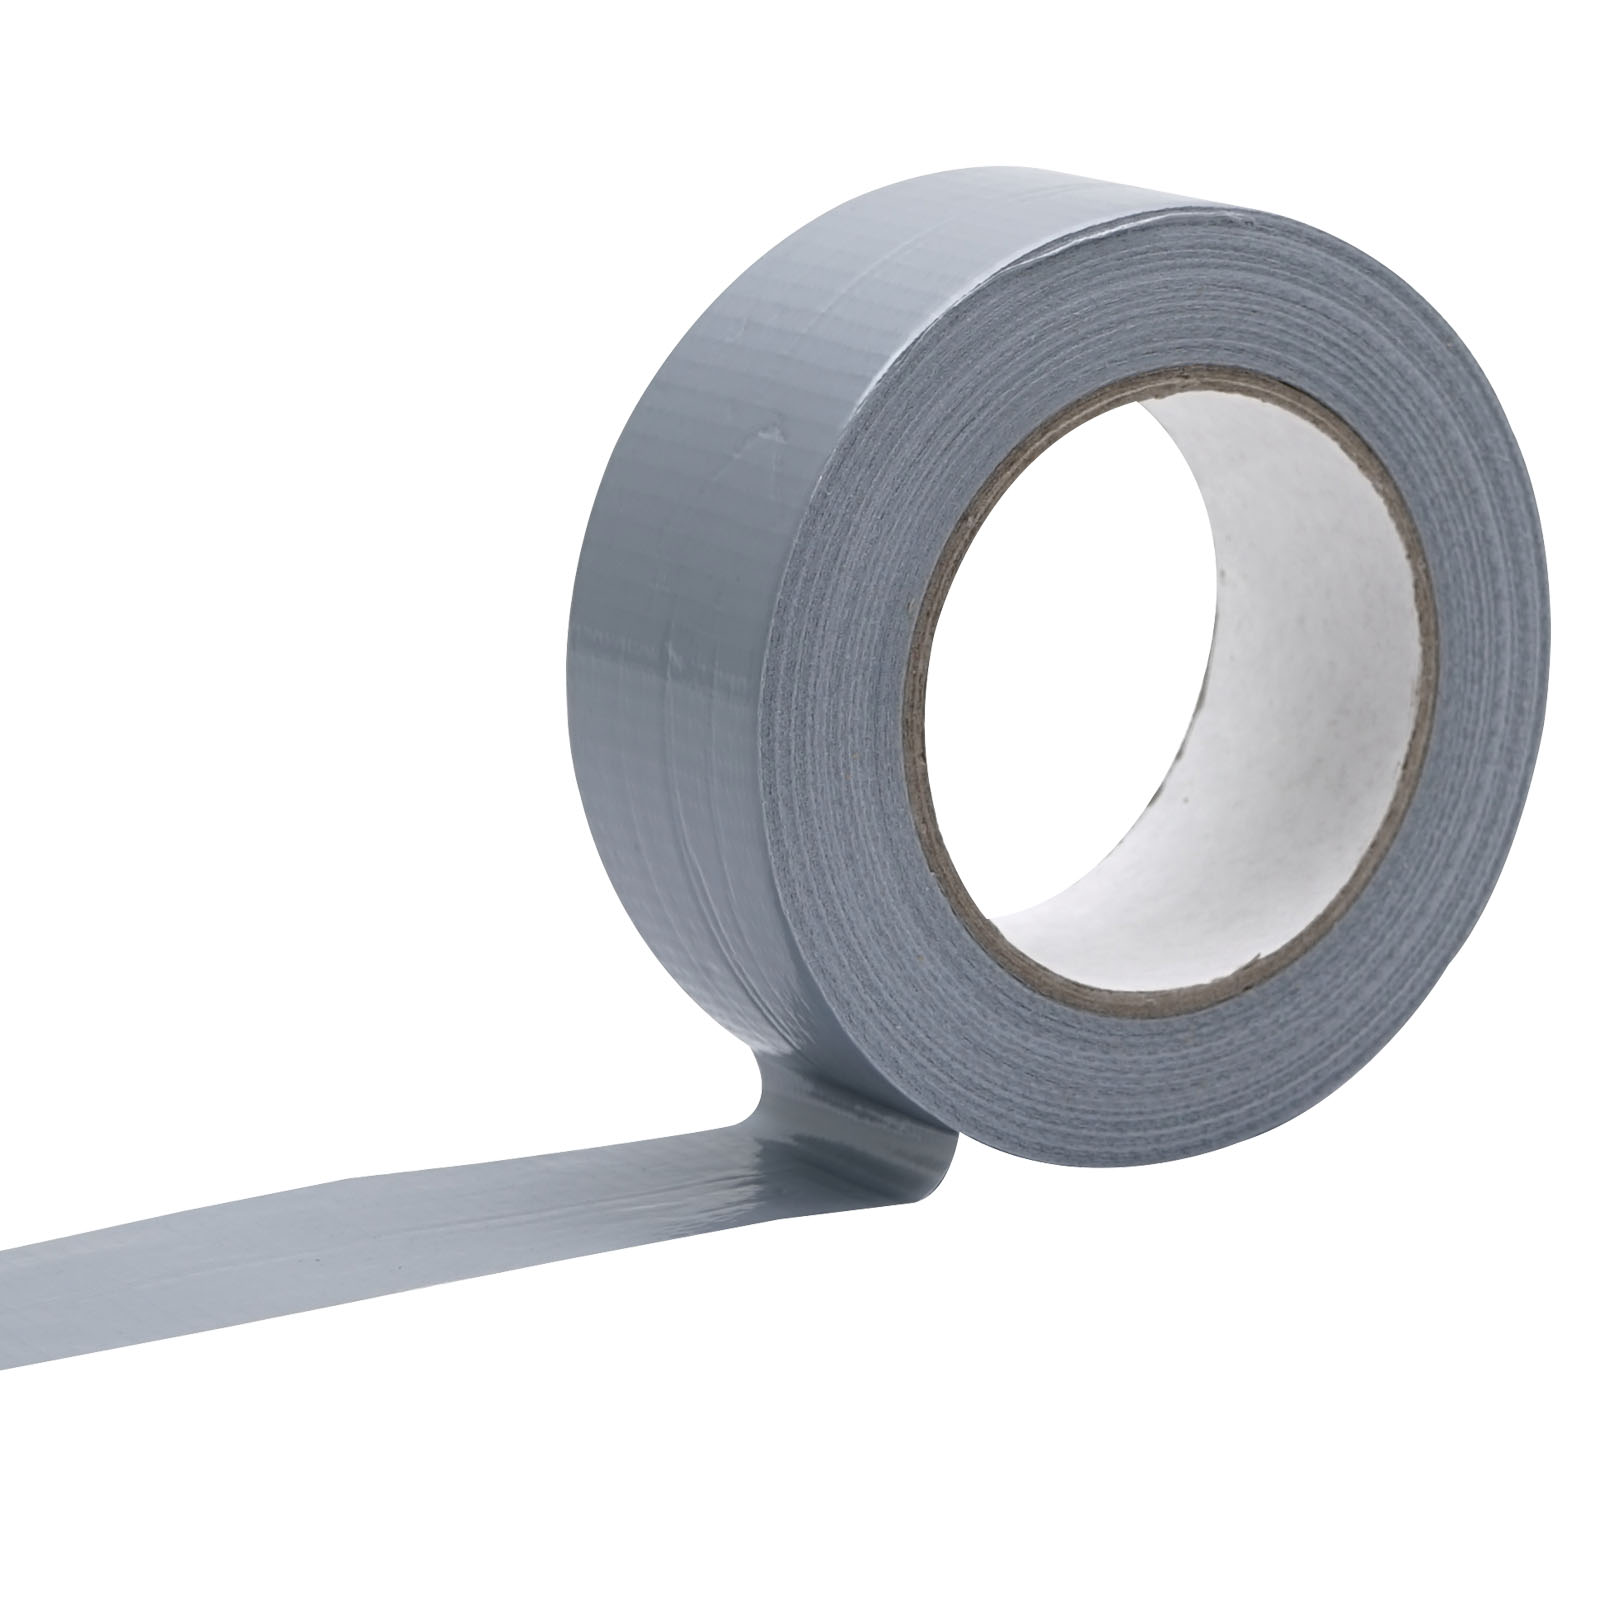 Silver Cloth Gaffer Tape